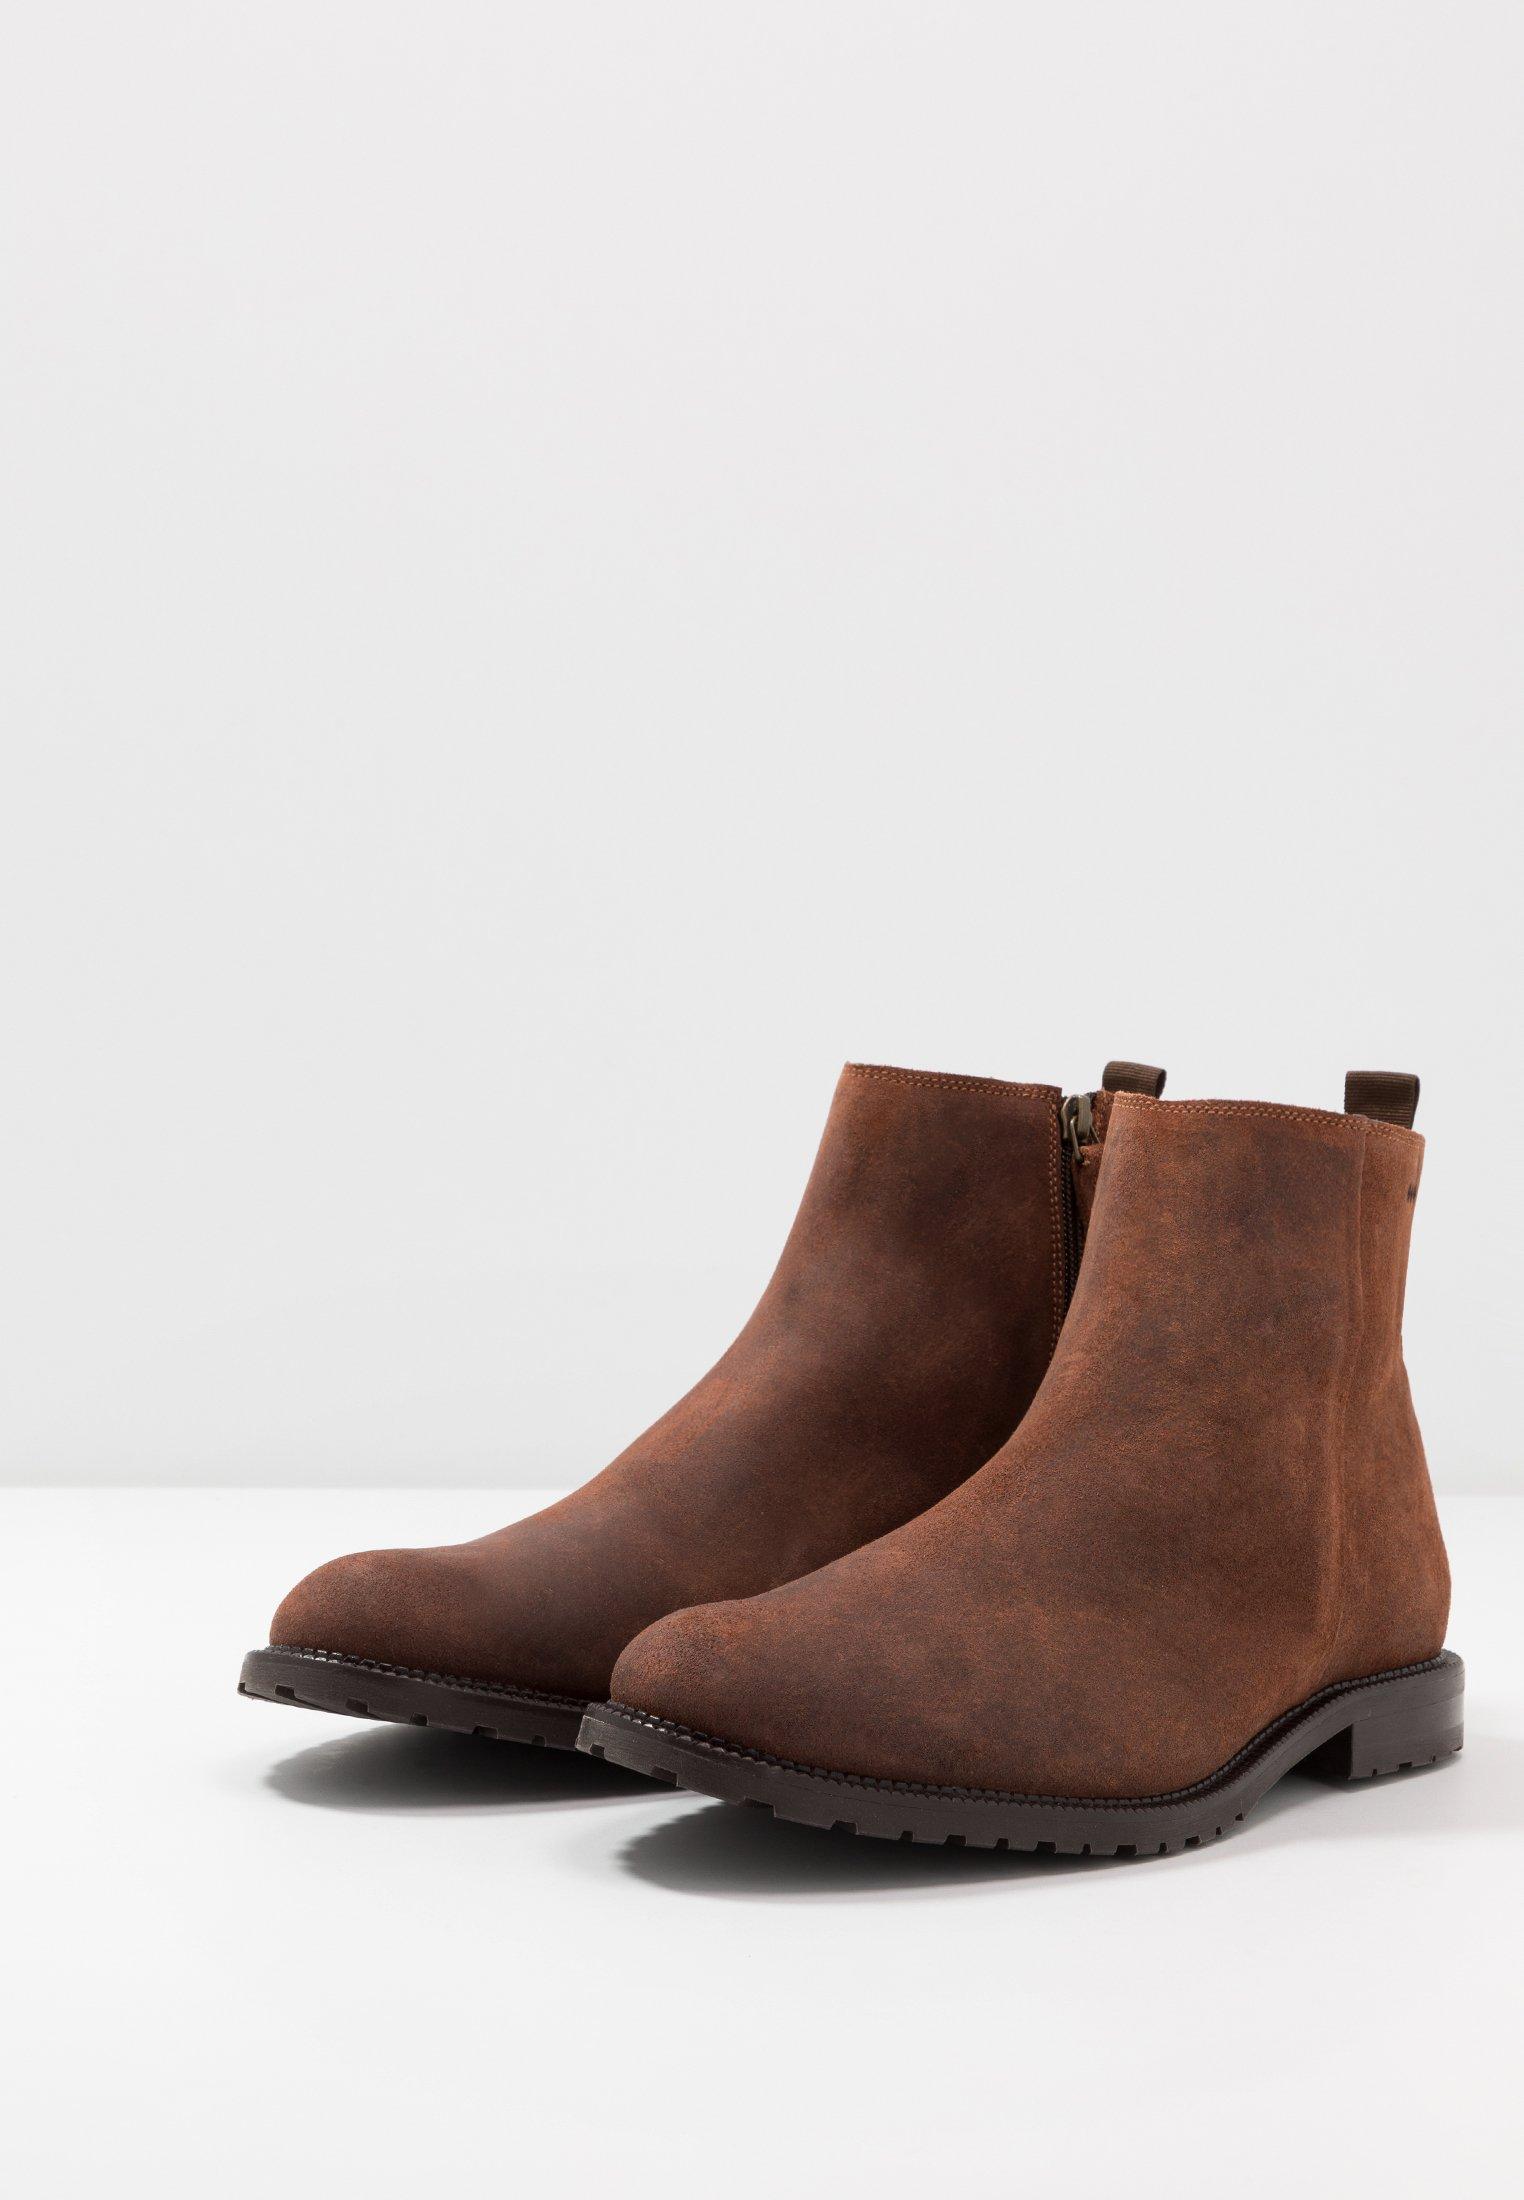 Royal Republiq Alias City Hiker Ankle Boot - Classic Boots Tan